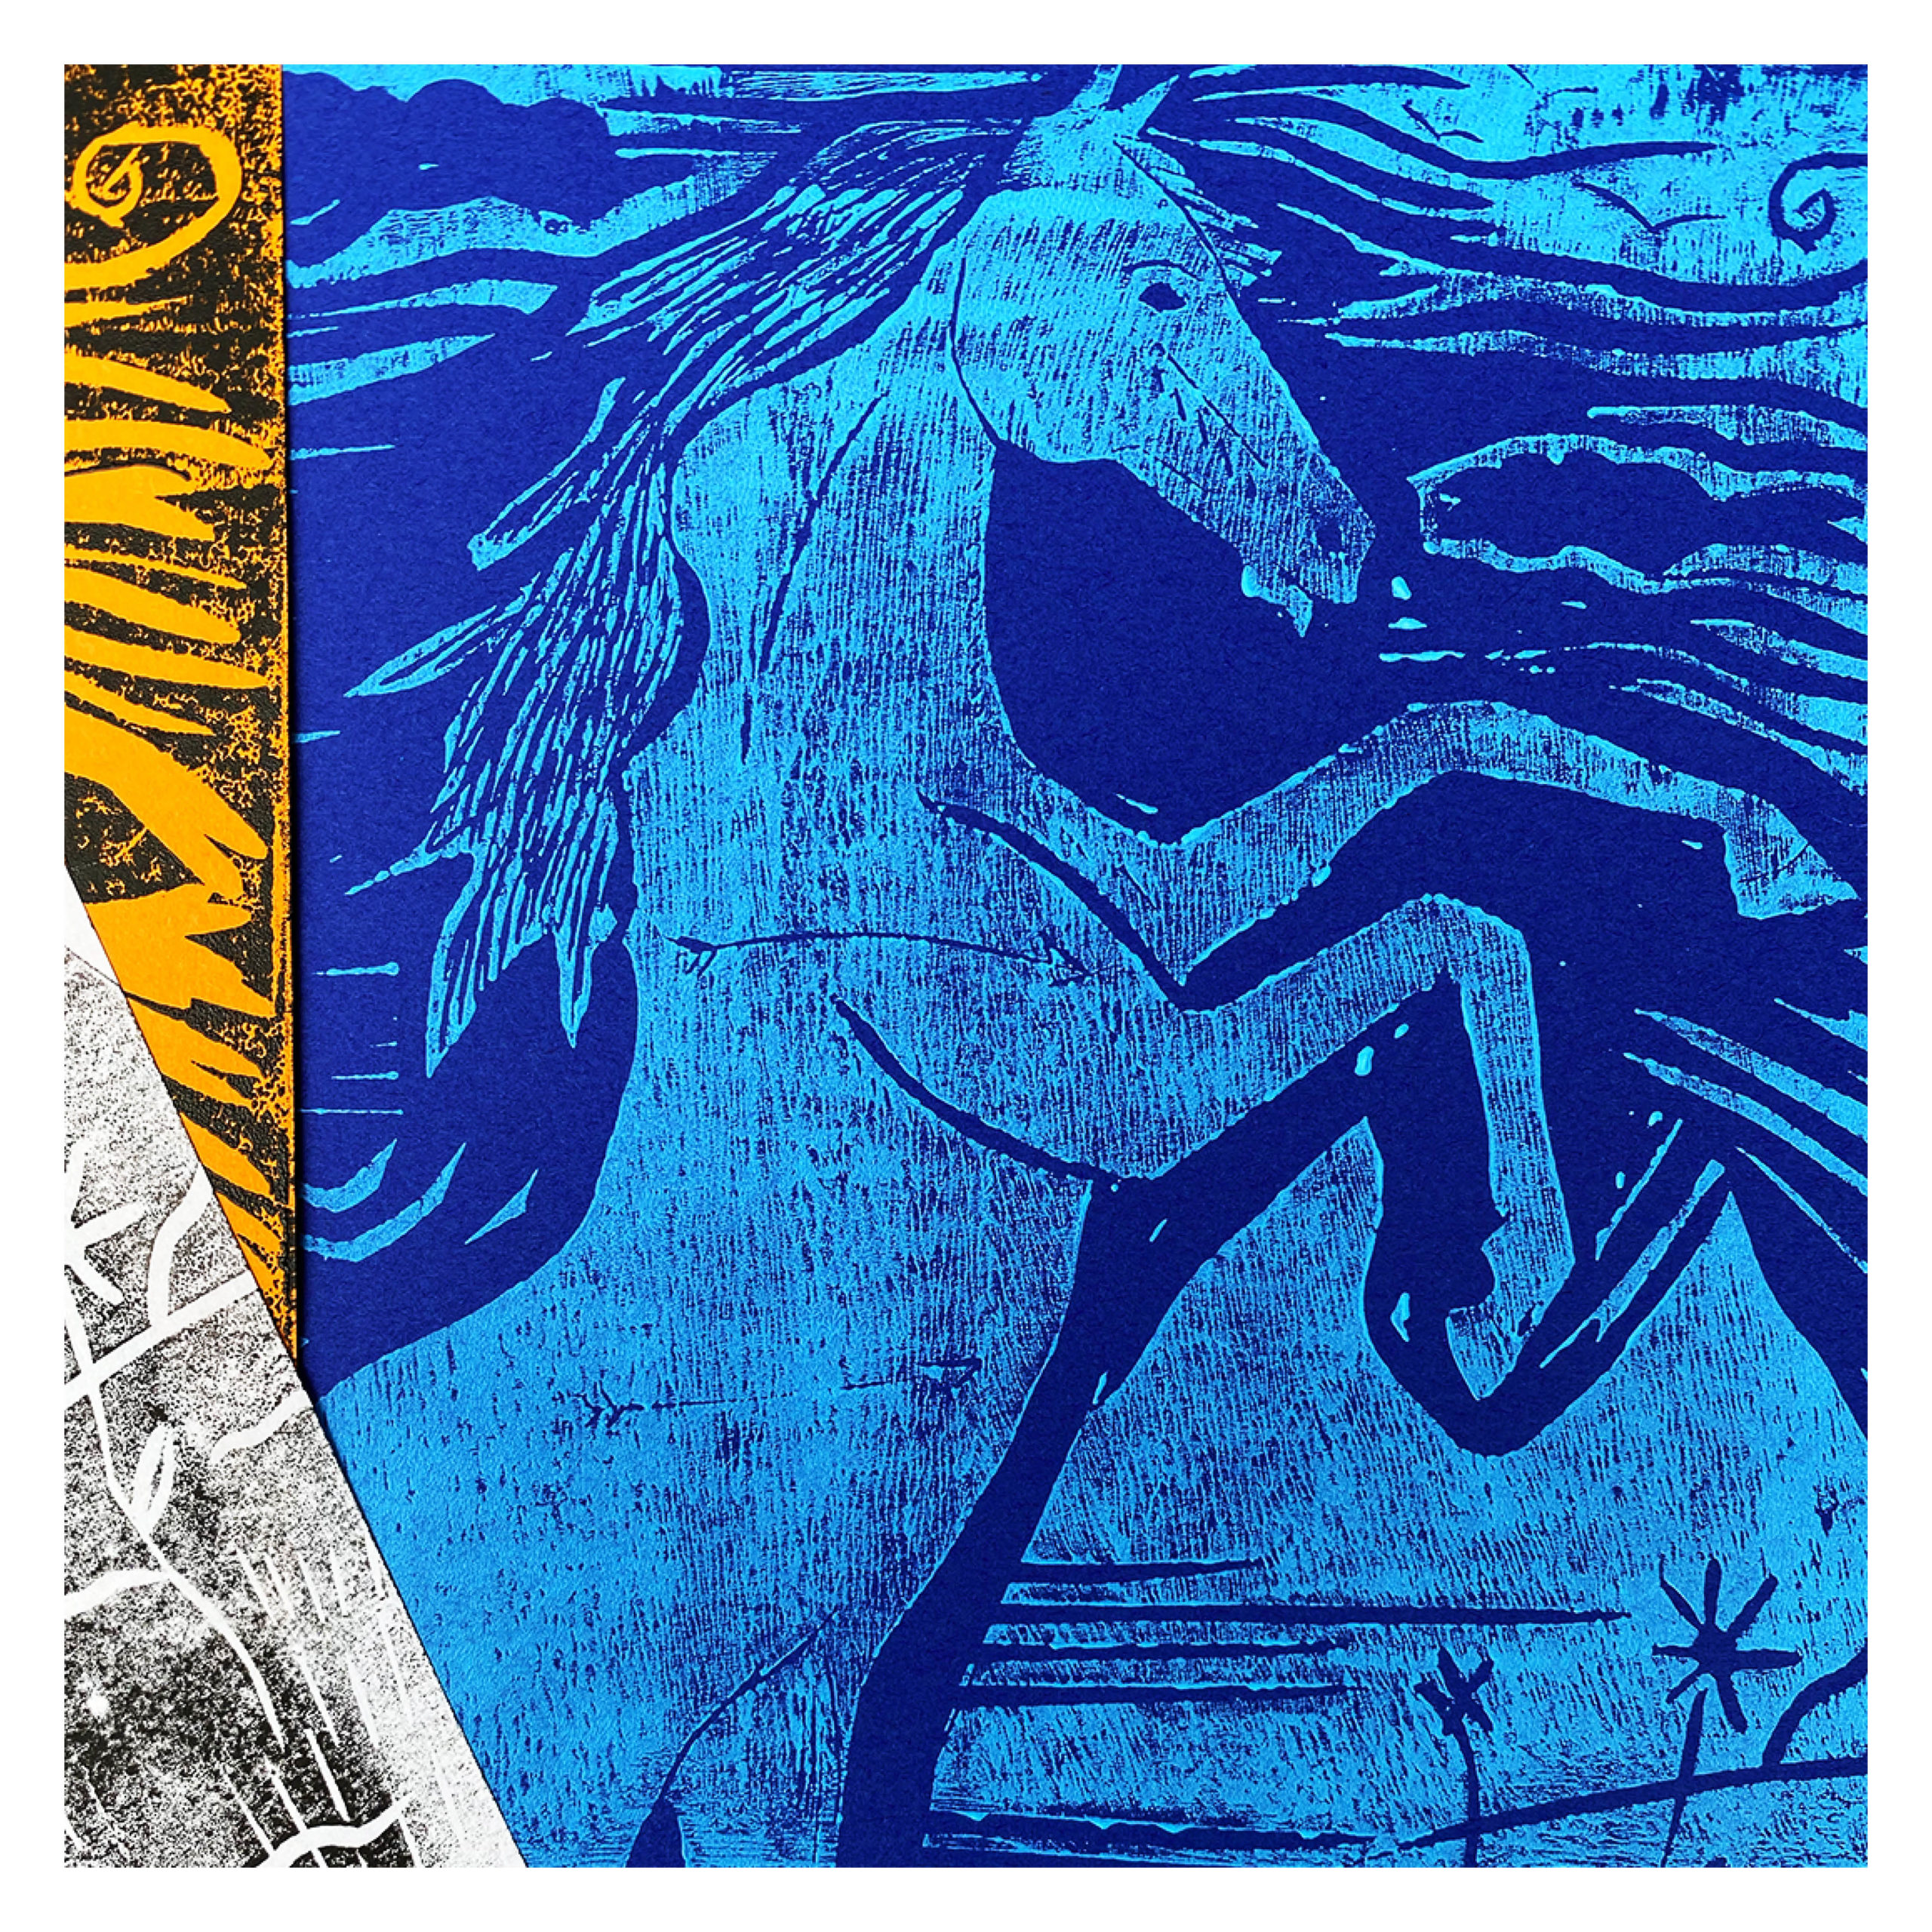 Sofia Zubi, Horse, 9x12in., Linocut Prints, 6/6 per color